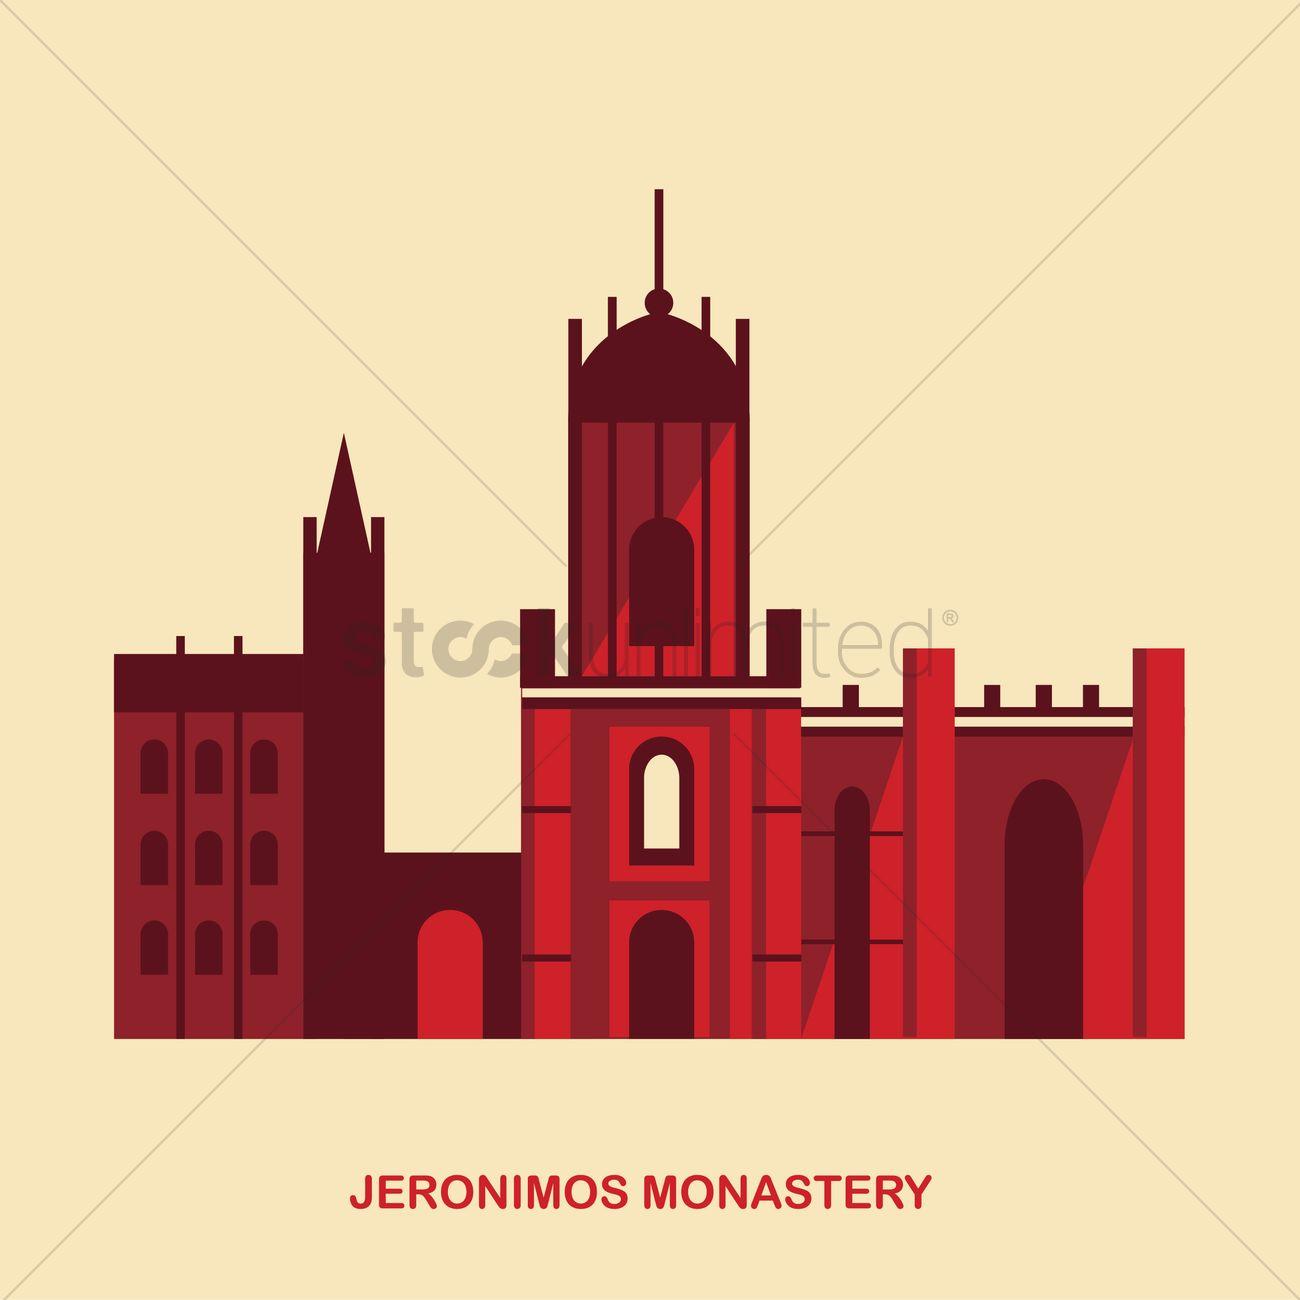 Jeronimos monastery Vector Image.